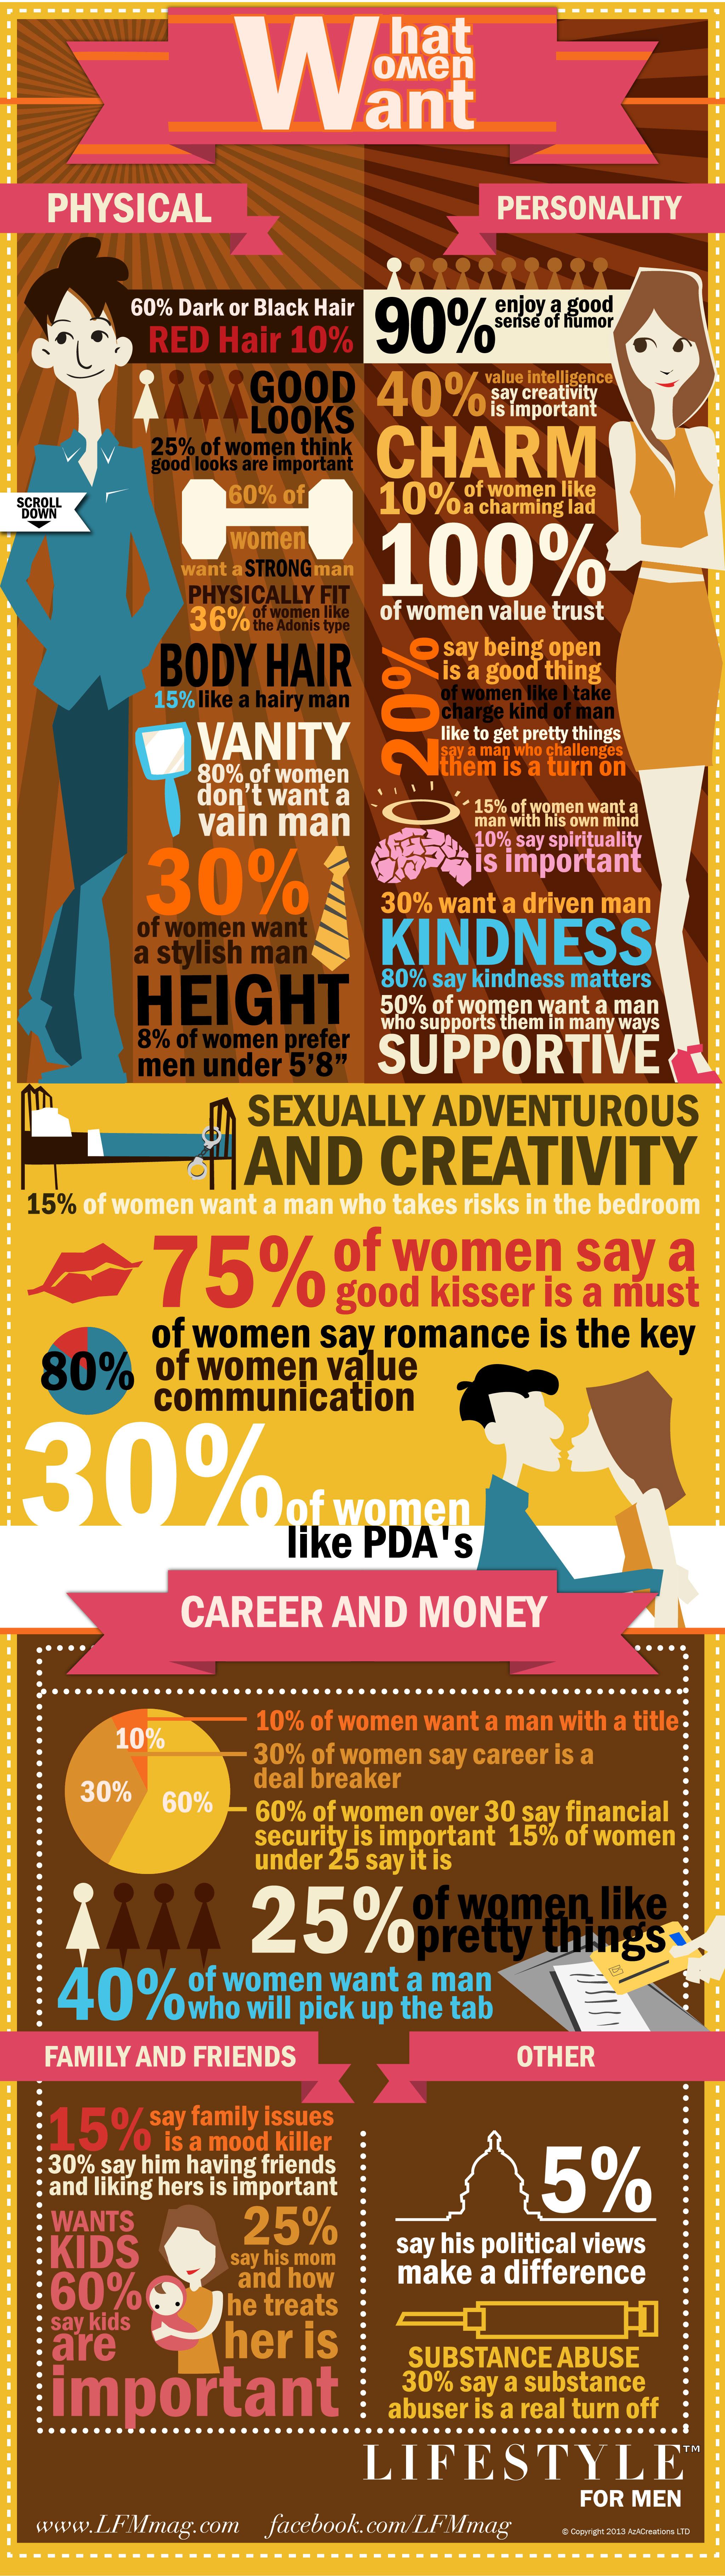 WhatWomenWant-LifestyleForMenMagazine